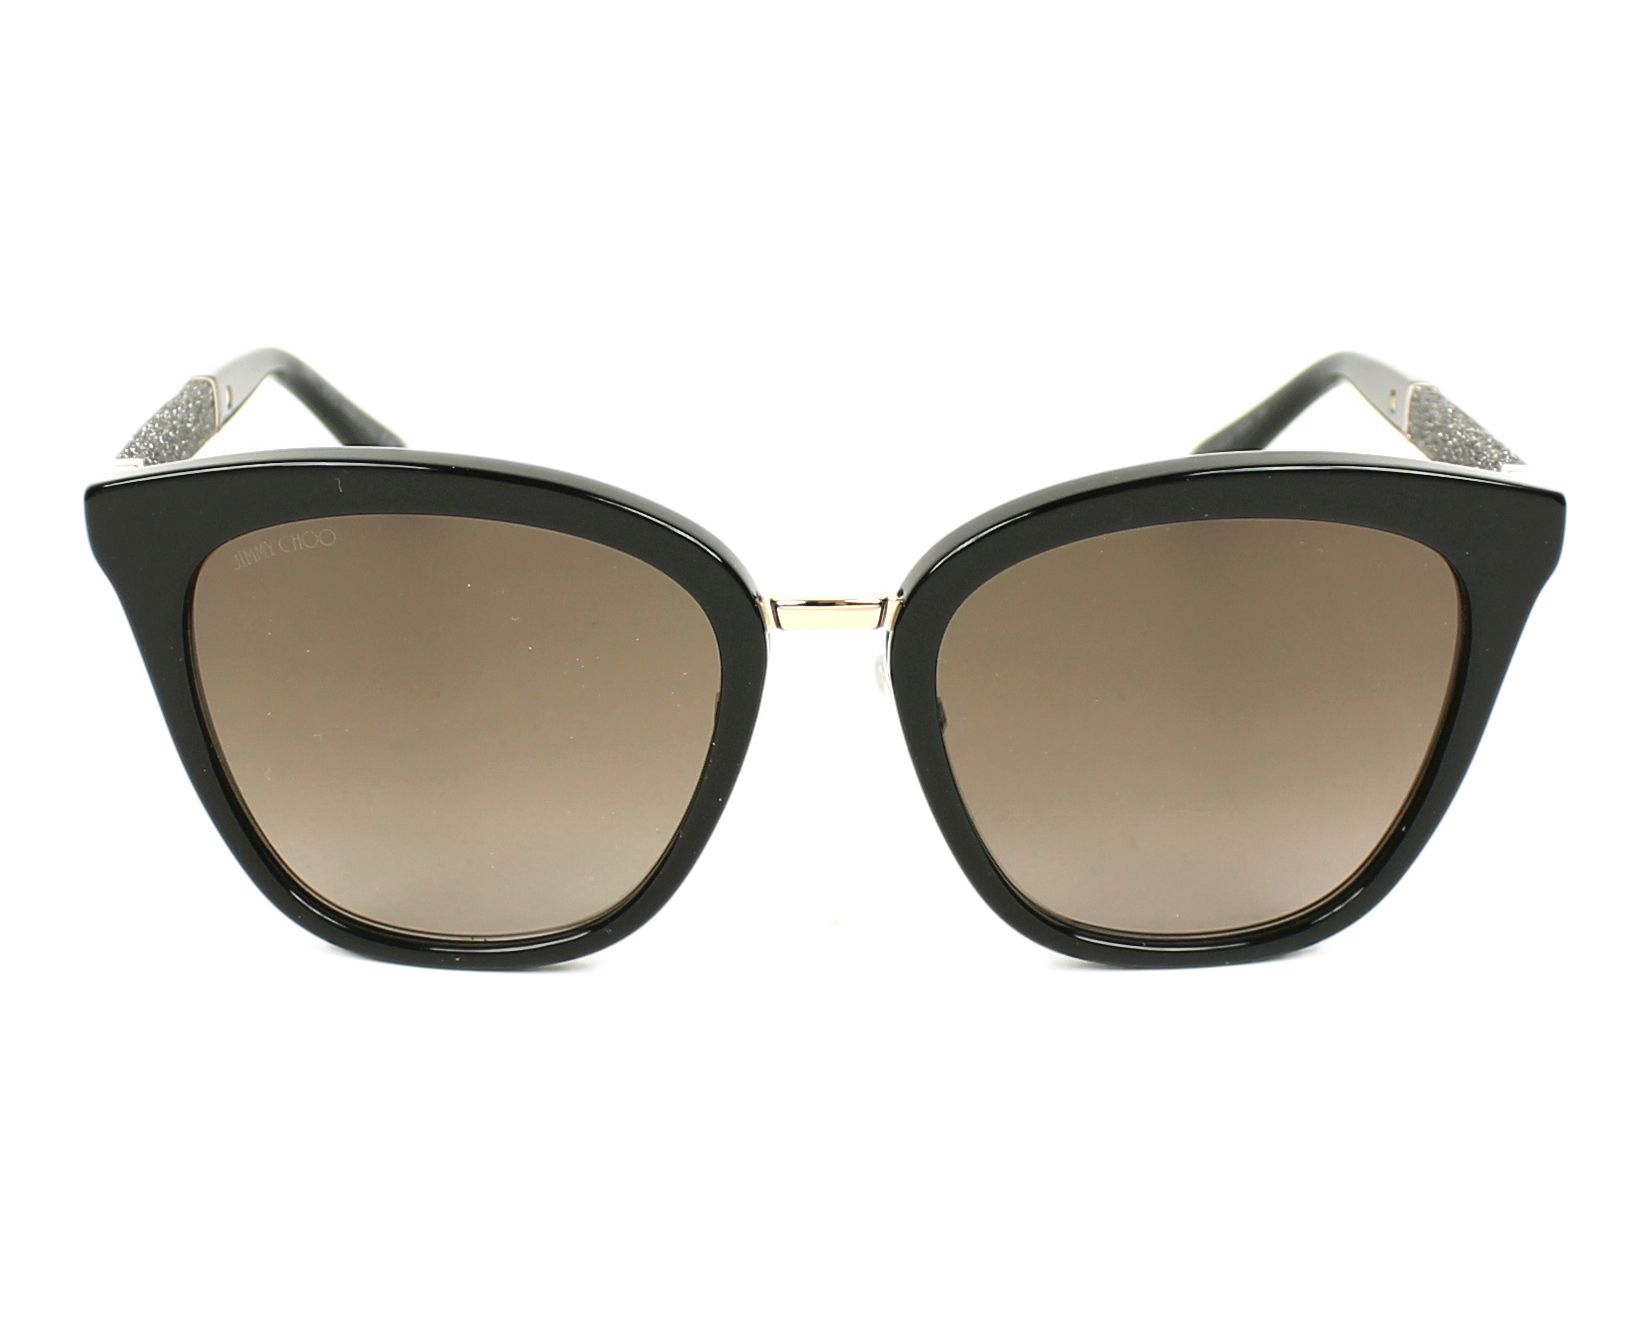 Sunglasses JIMMY CHOO FABRY/S KBE